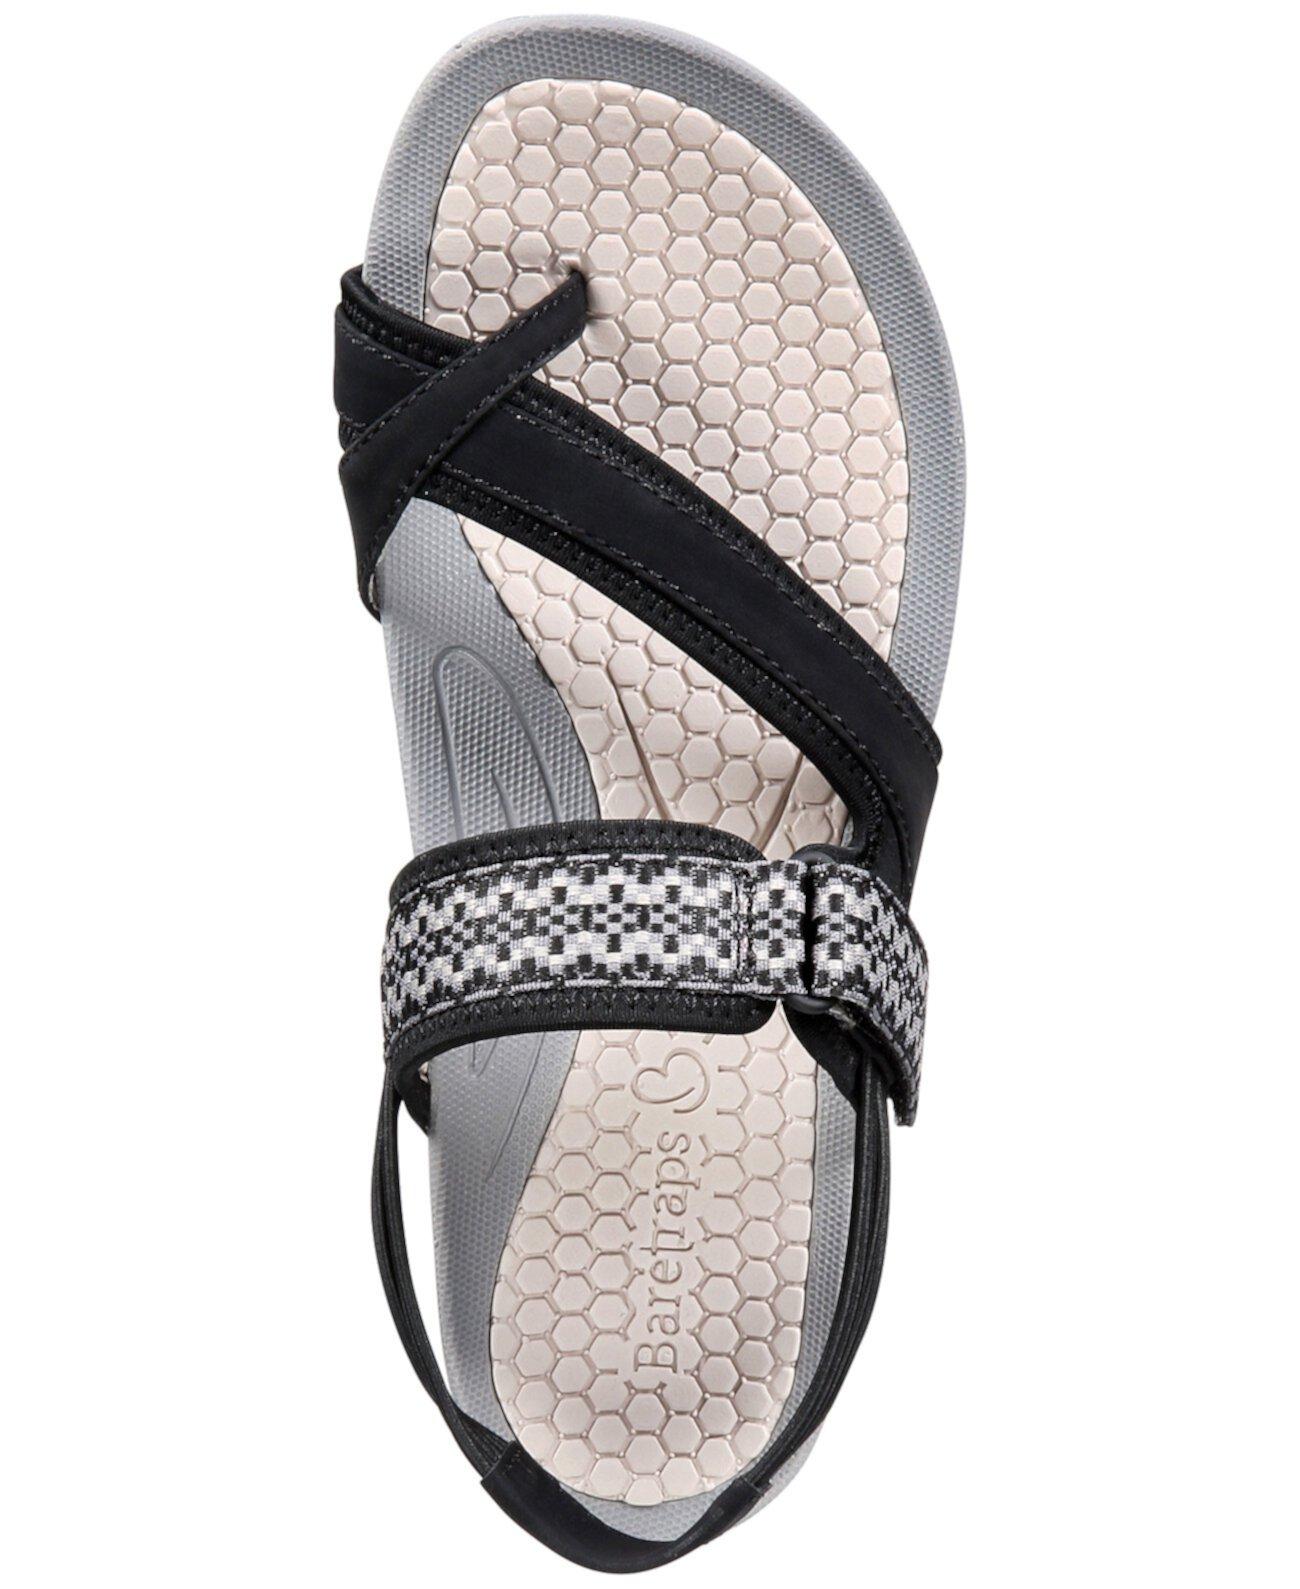 Danique Rebound Technology ™ Наружные сандалии Baretraps